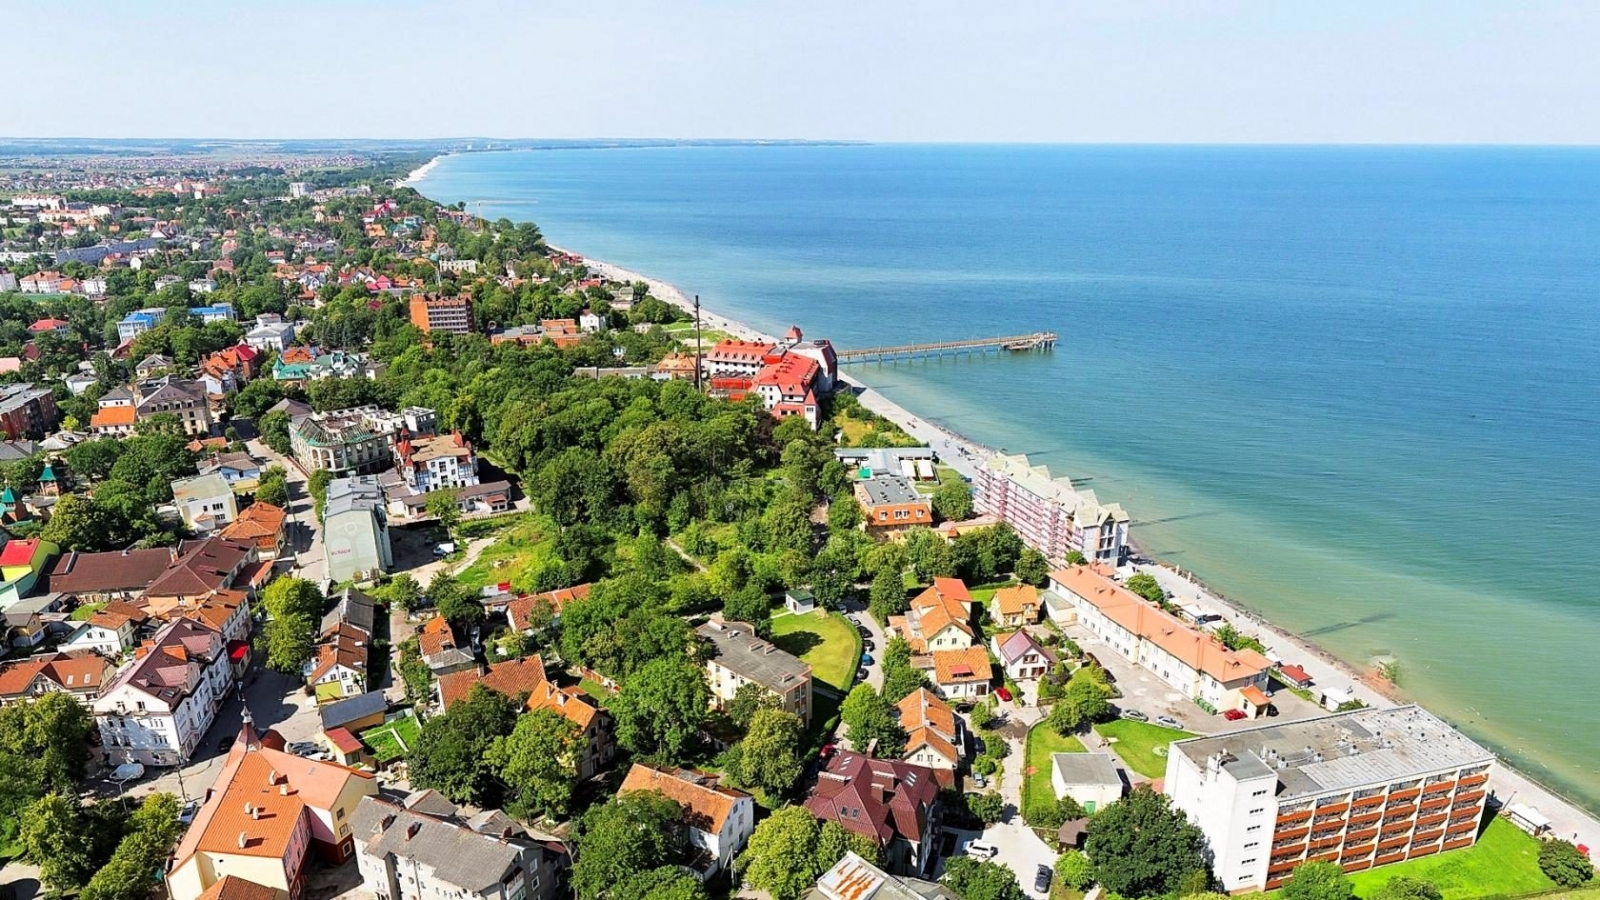 зеленоградск фото города представителями